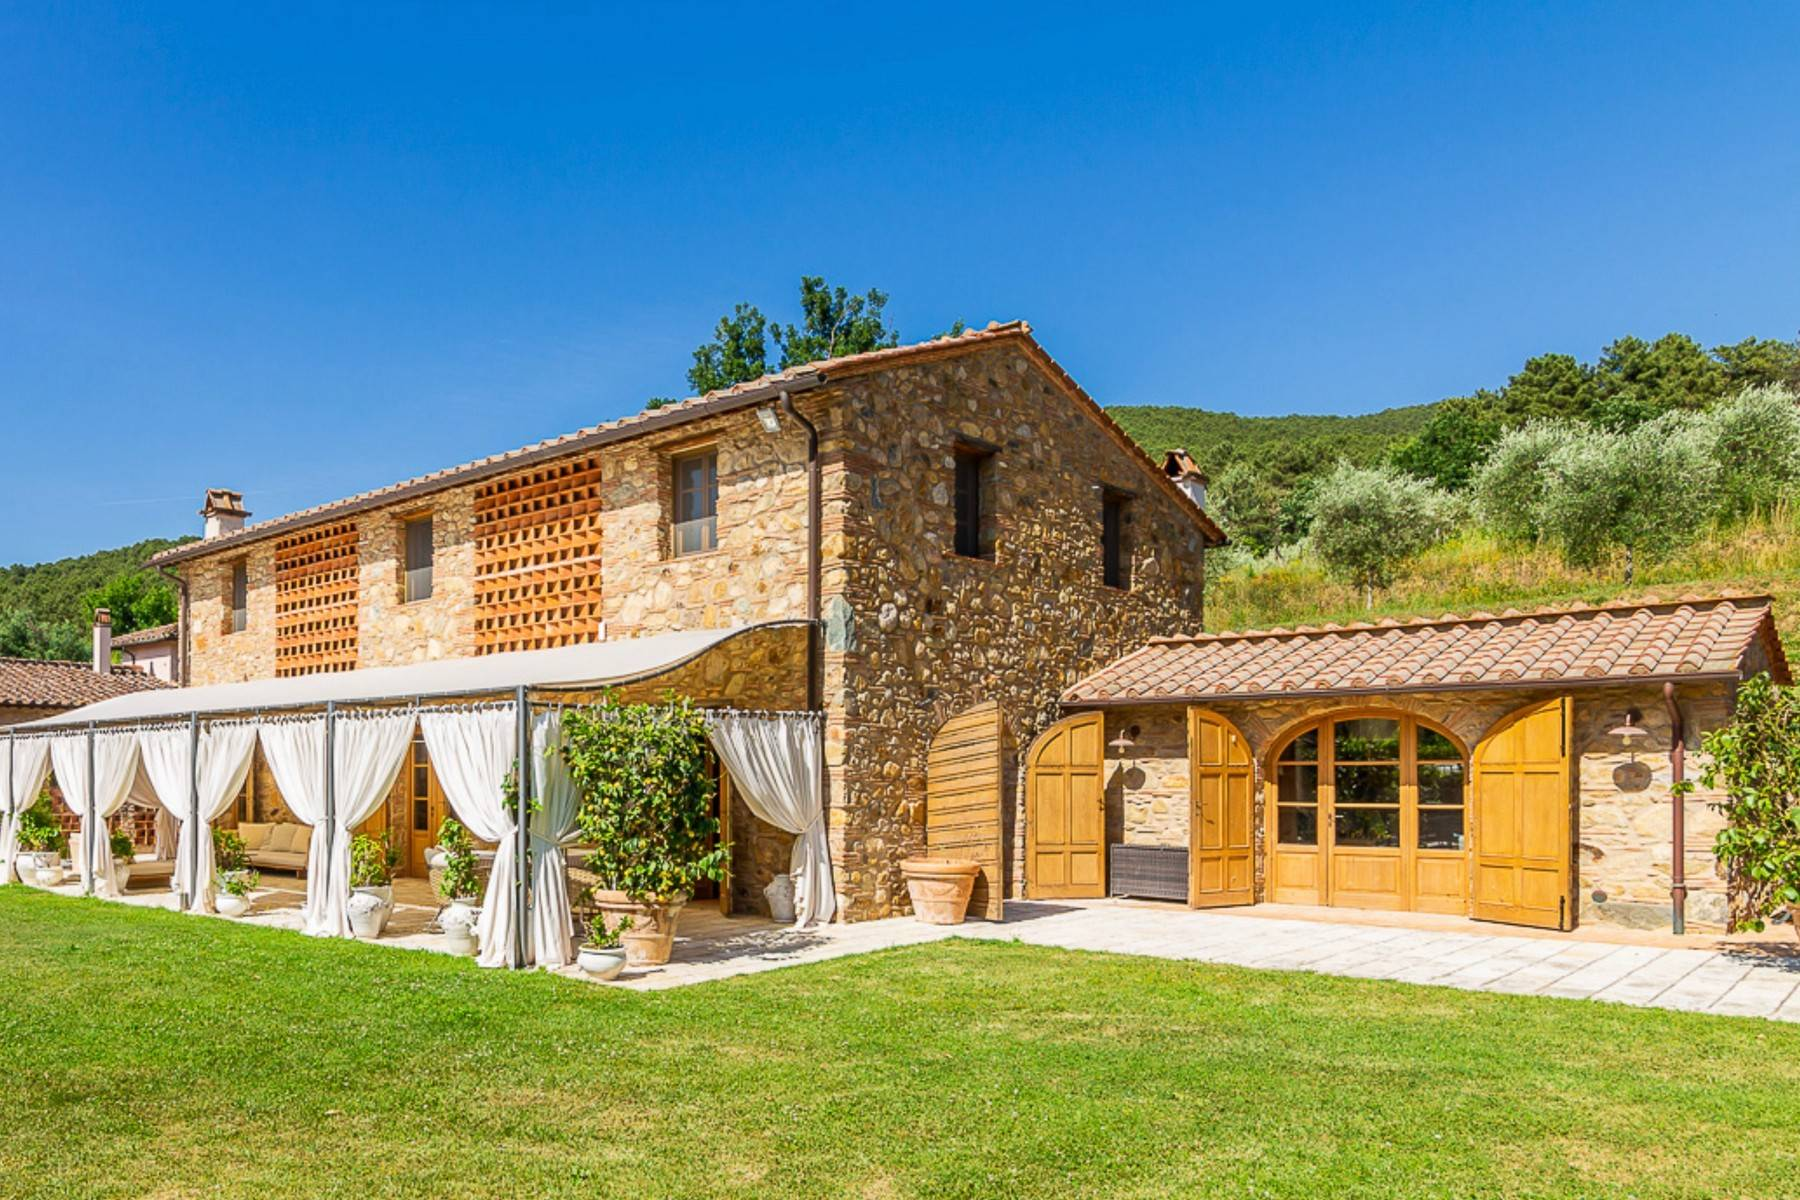 Villa in Vendita a Lucca: 5 locali, 1130 mq - Foto 3